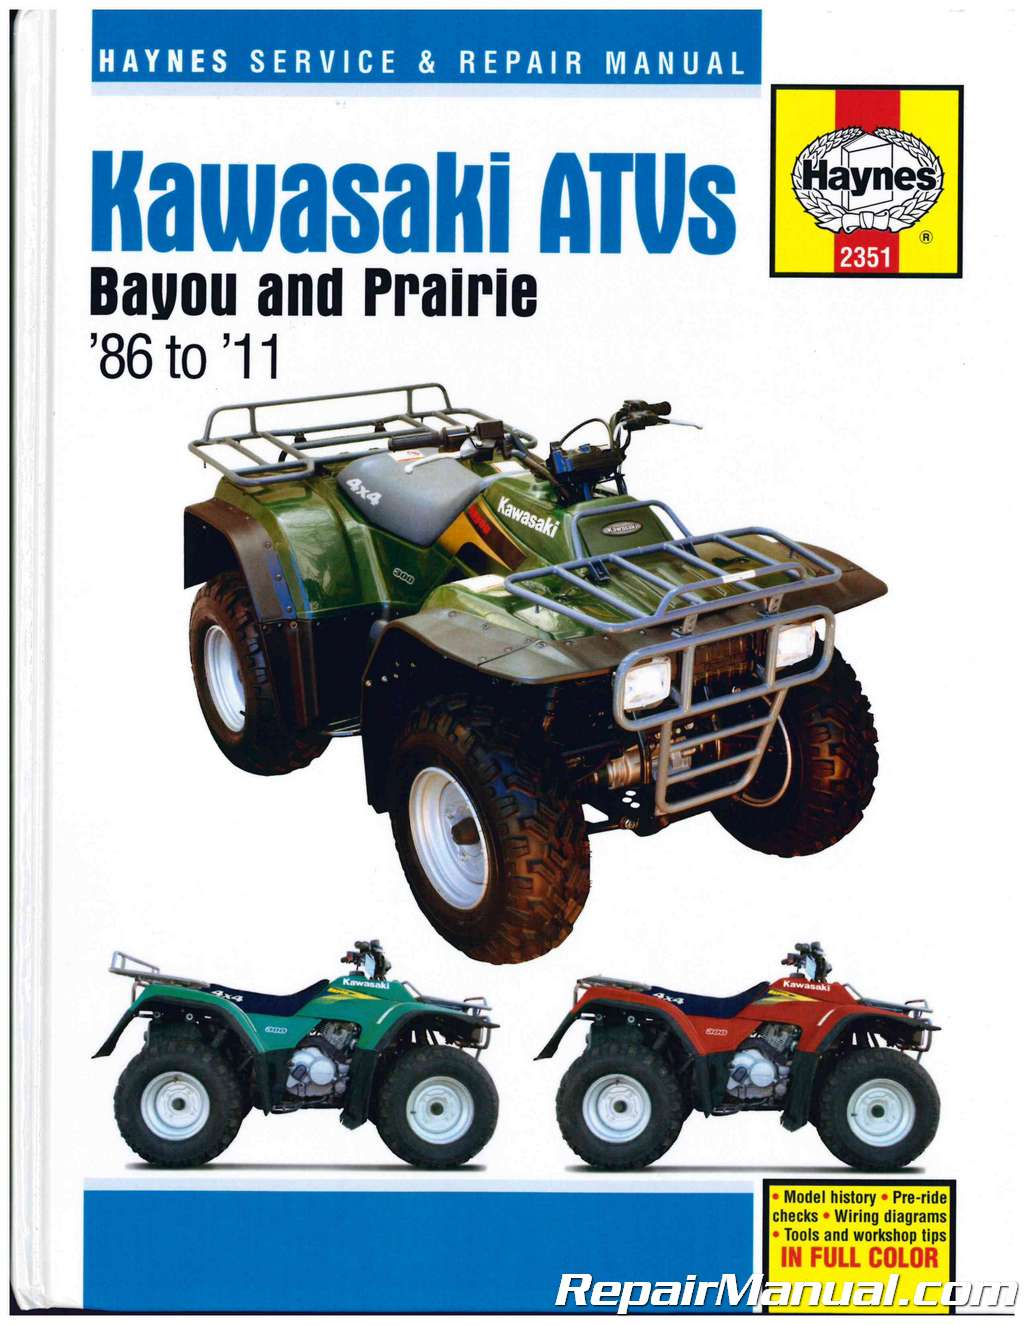 hight resolution of 1997 kawasaki prairie 400 4x4 repair manual